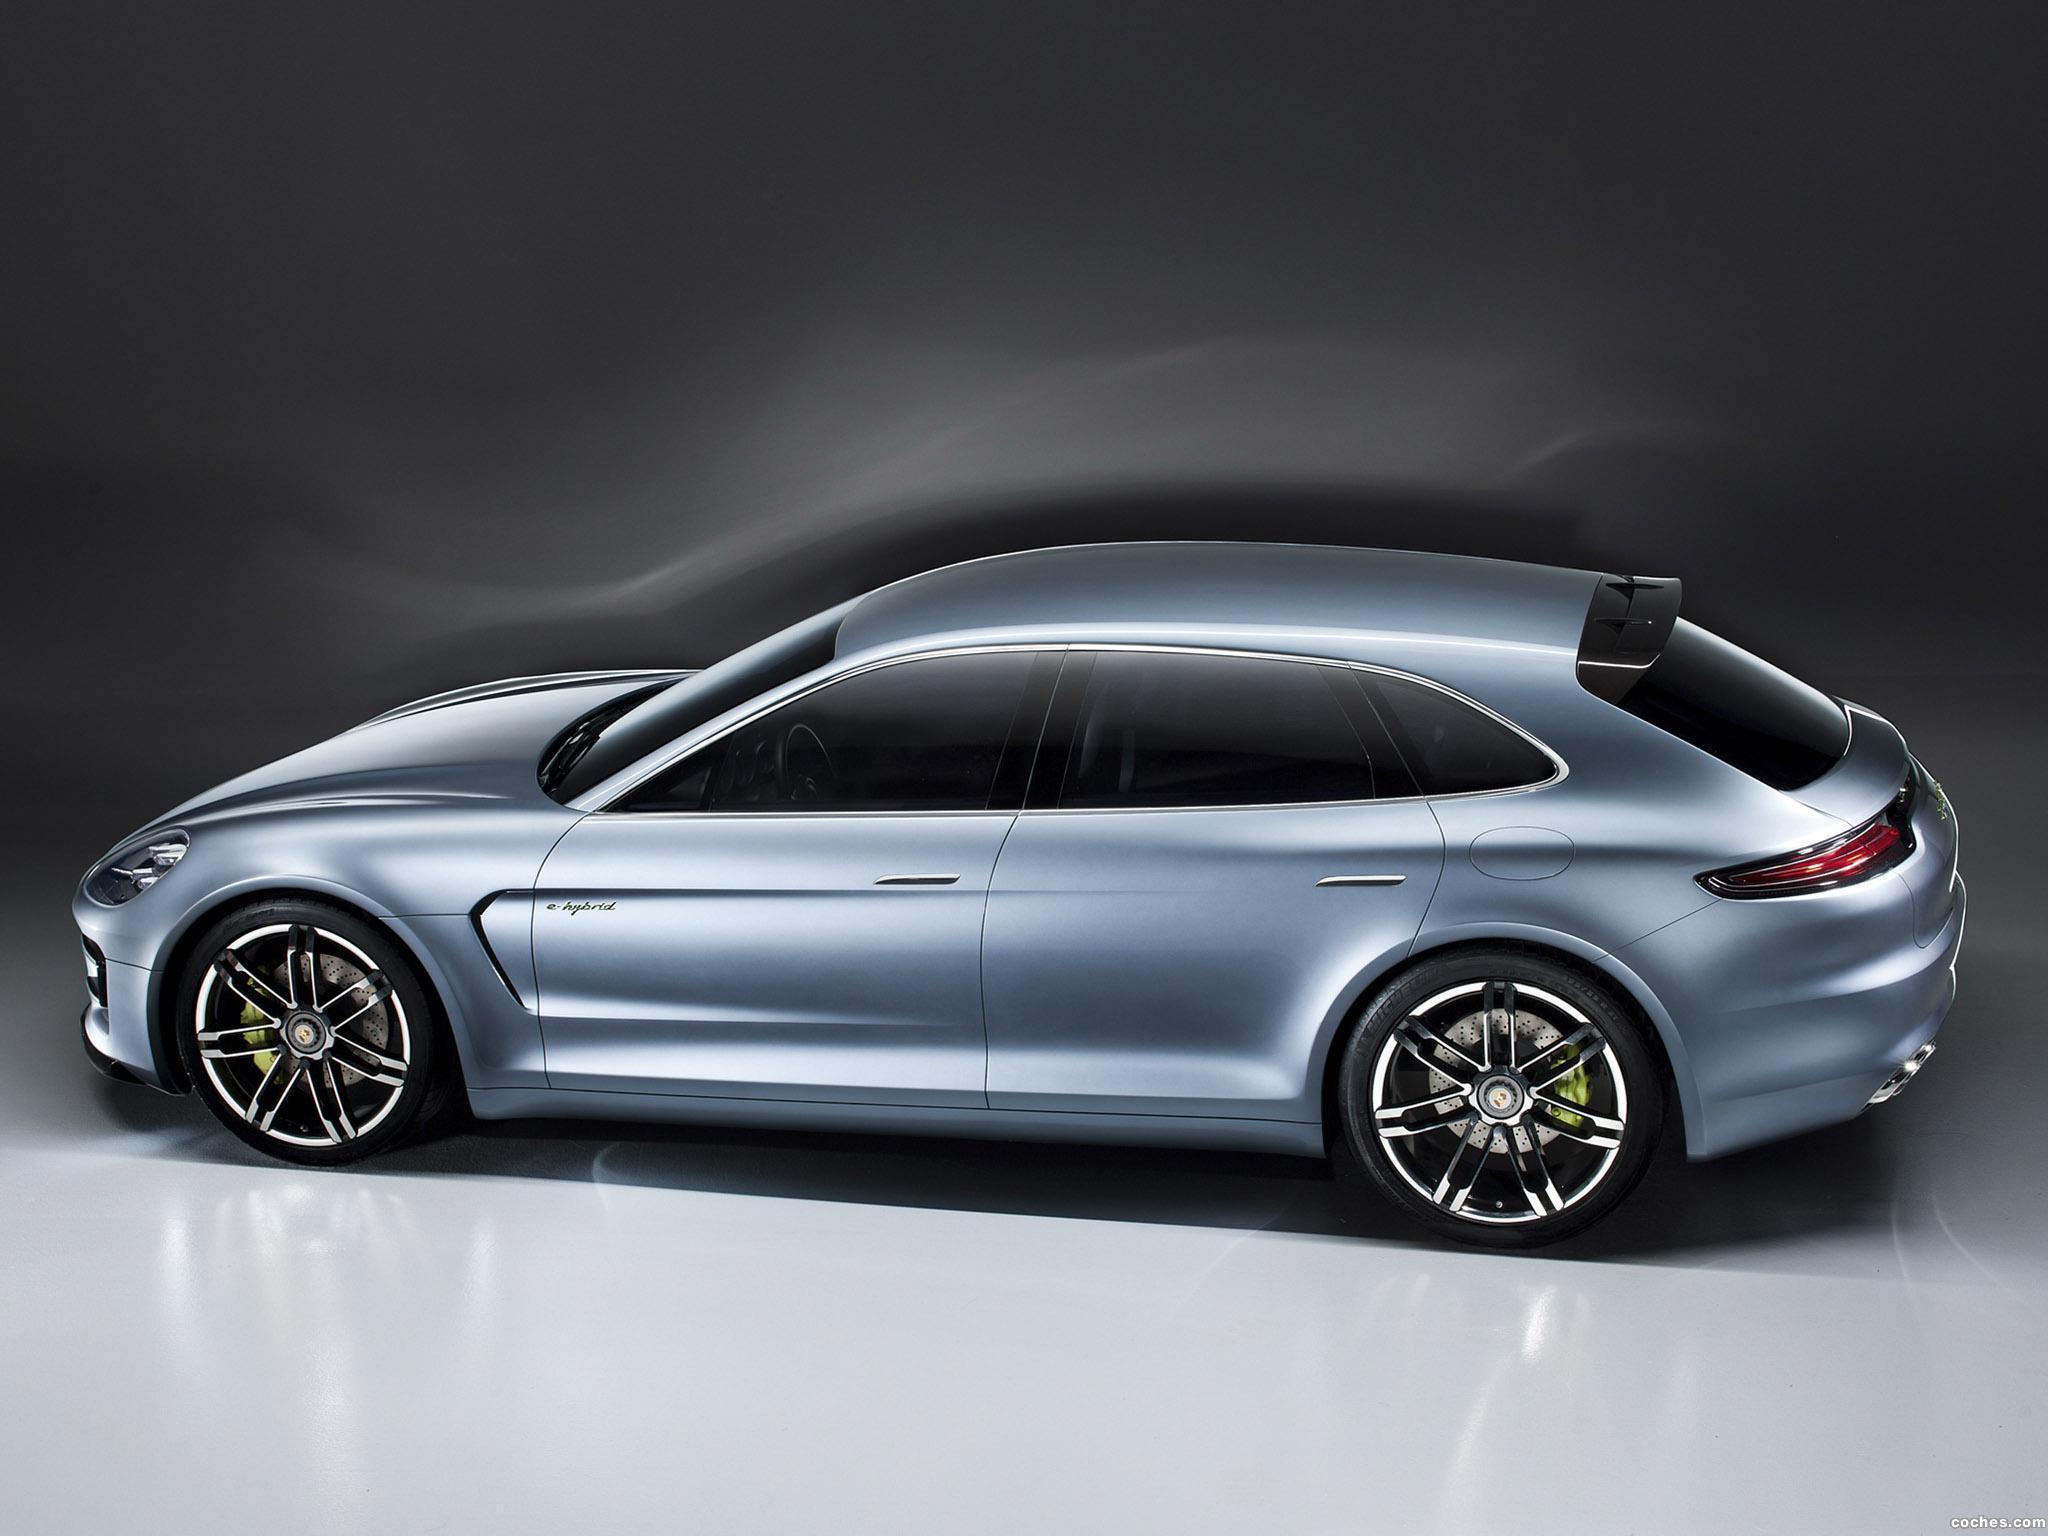 Foto 2 de Porsche Panamera Sport Turismo Concept 2012